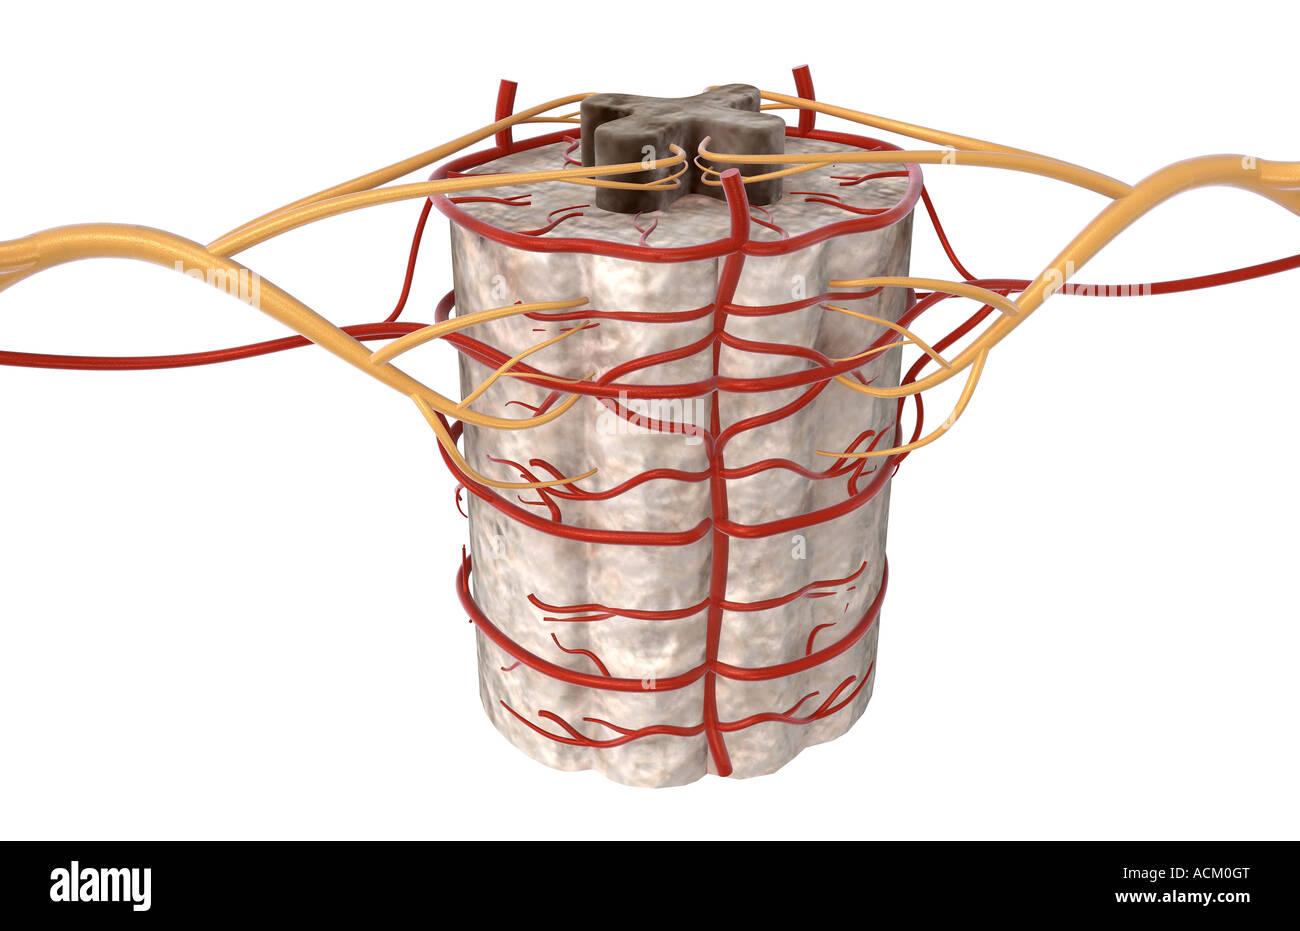 Spinal Arteries Stock Photo 13183943 Alamy